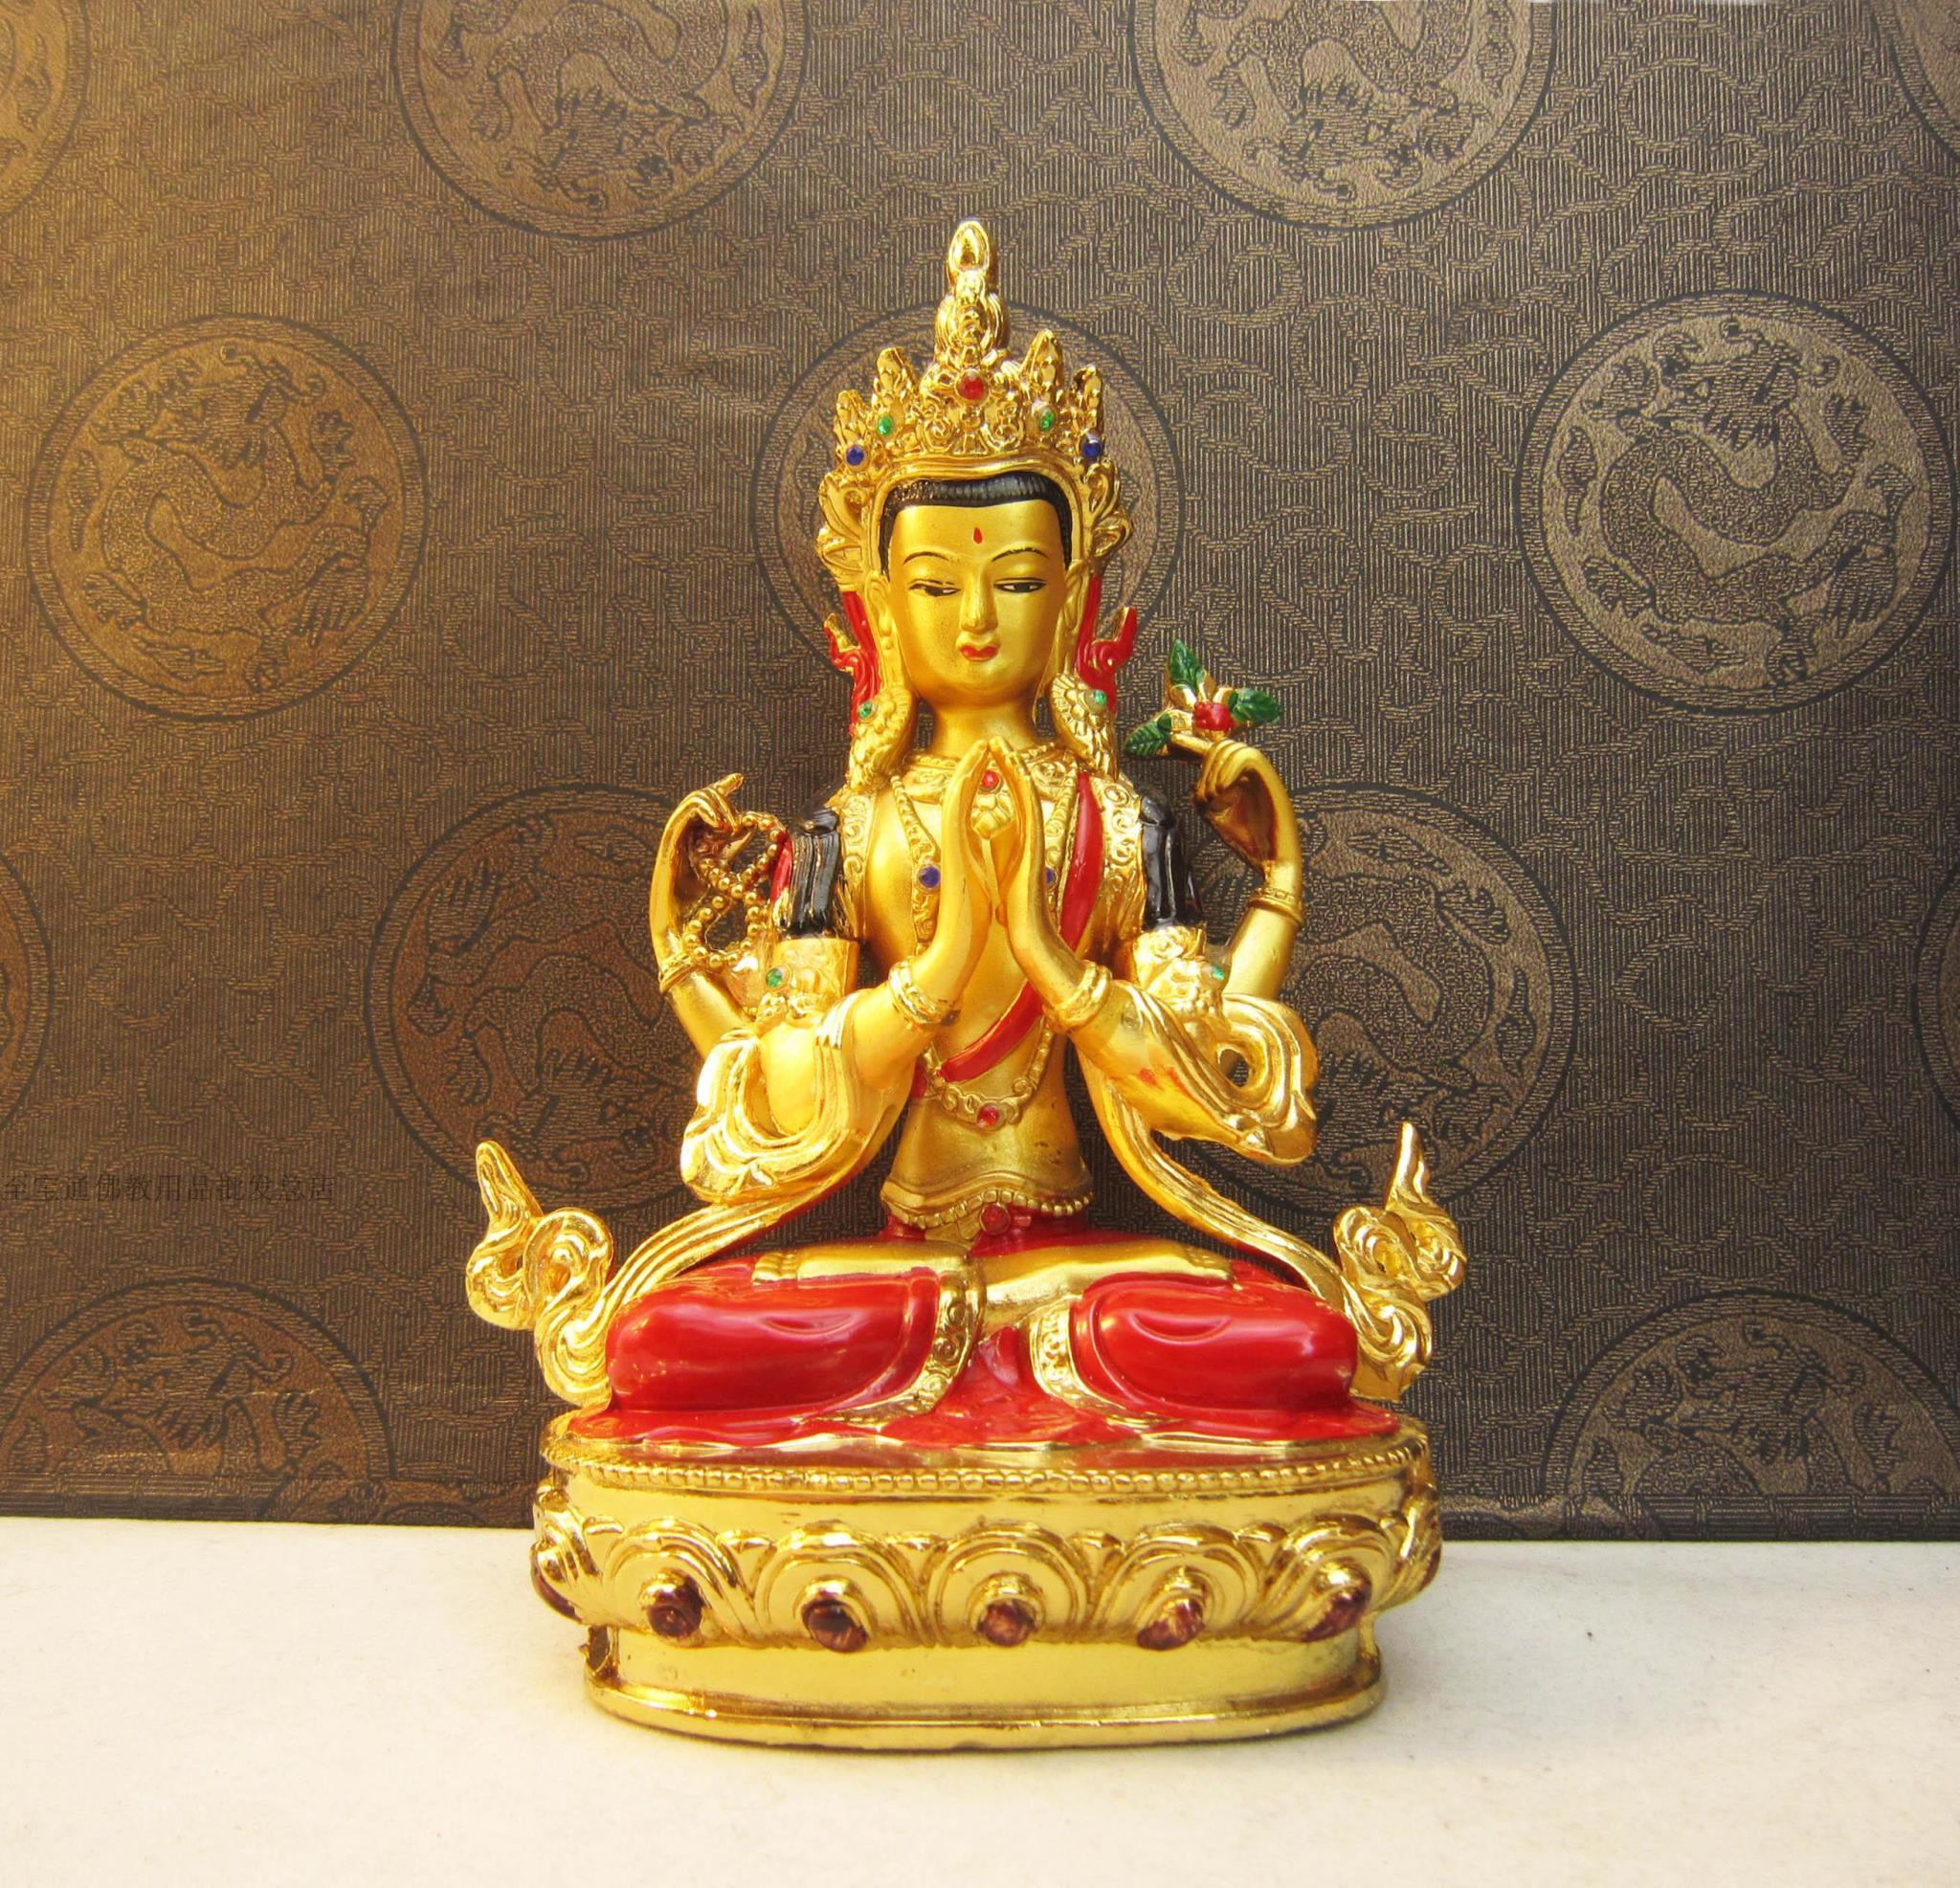 Tibetan Tantra, four arm Guanyin, Avalokitesvara Bodhisattva, Buddha statue, Guanyin figure, figurine, buddhism crafts~Tibetan Tantra, four arm Guanyin, Avalokitesvara Bodhisattva, Buddha statue, Guanyin figure, figurine, buddhism crafts~